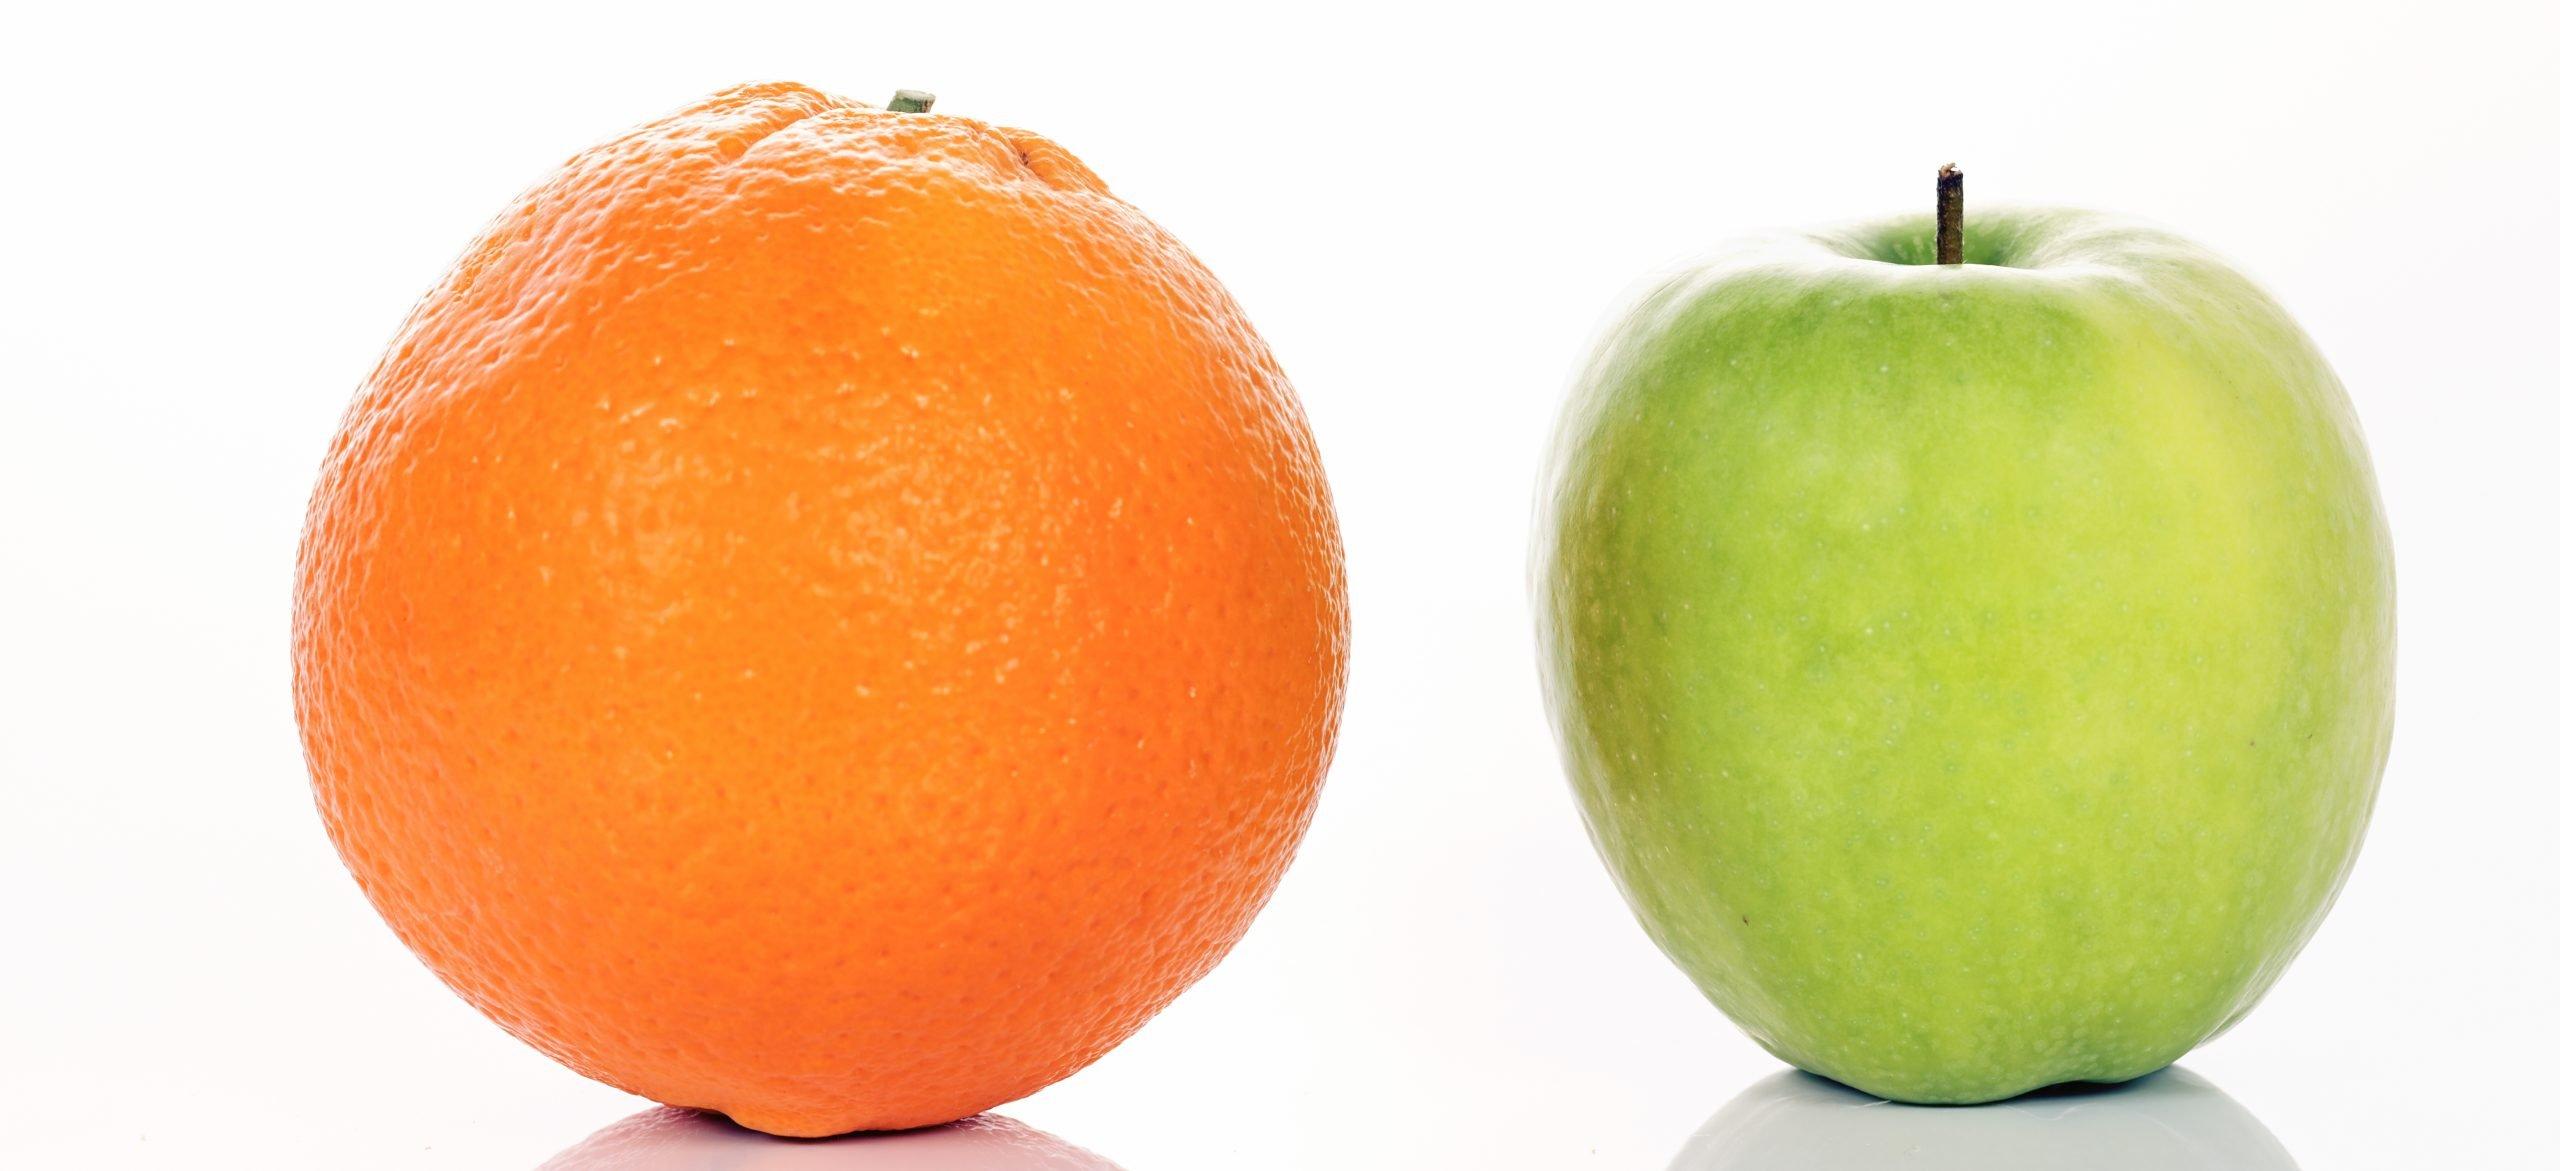 bitcoin gold stock market comparison apples oranges